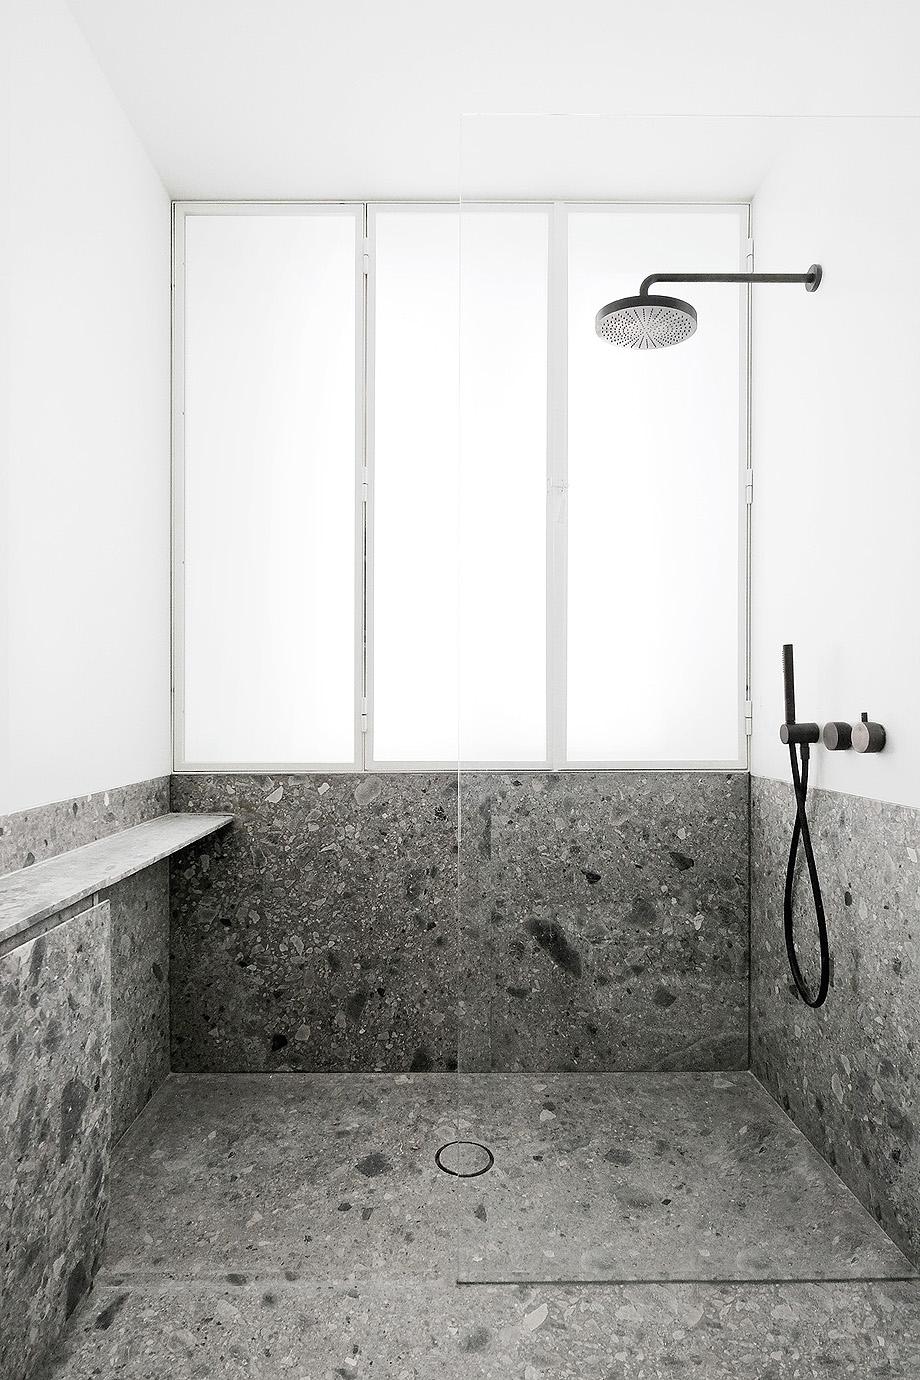 apartamento p-420 de nicolas dorval-bory - foto nicolas dorval-bory (10)